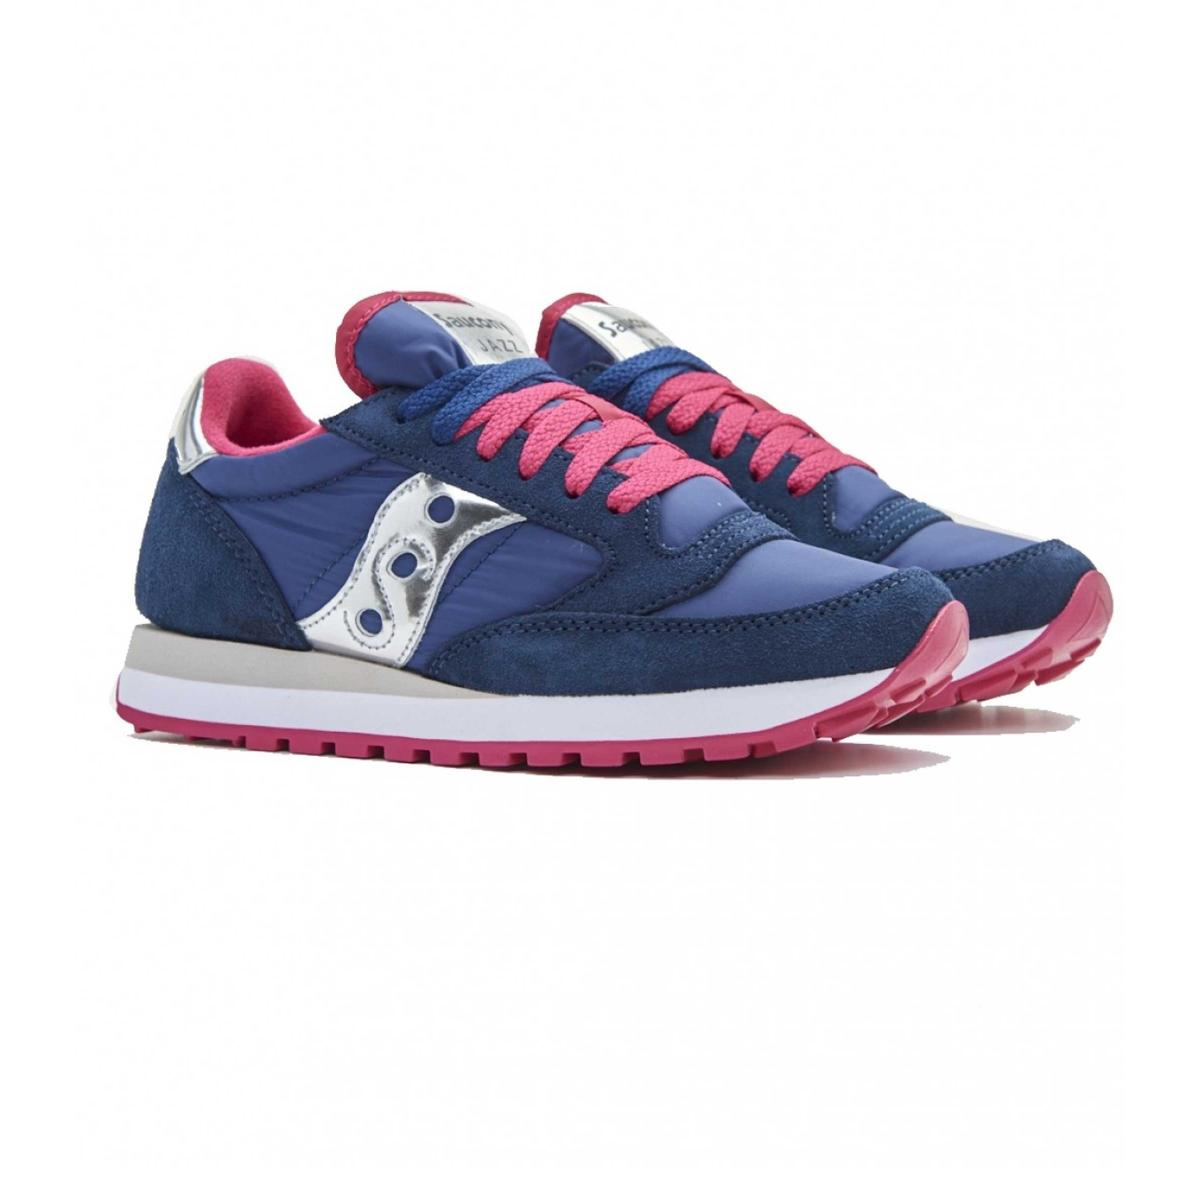 Scarpe Sneakers Saucony Jazz Original da donna rif. S1044-540